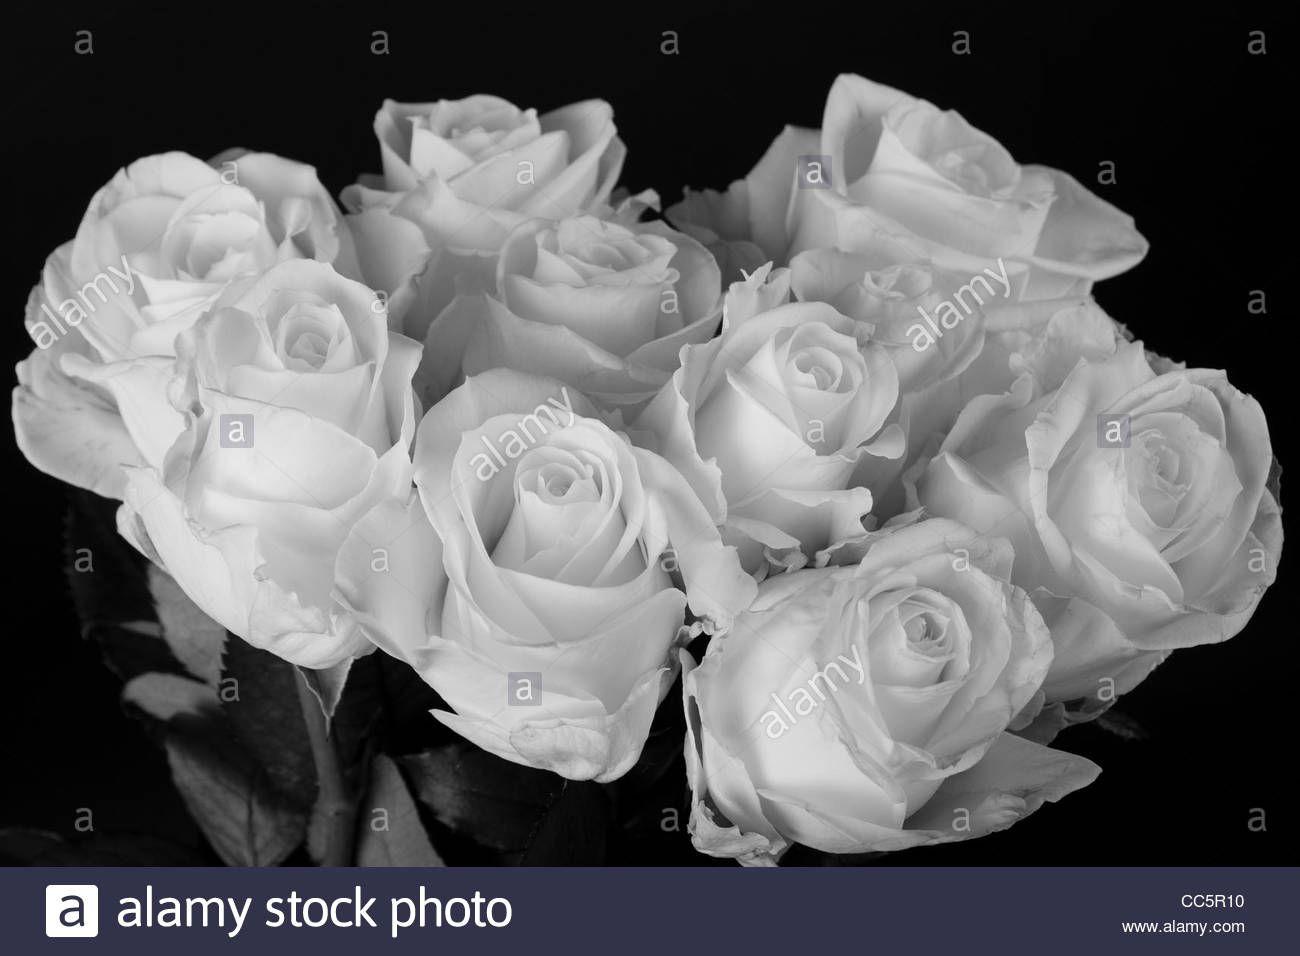 Download Wallpaper Rose Flower White Leaves Black Background S